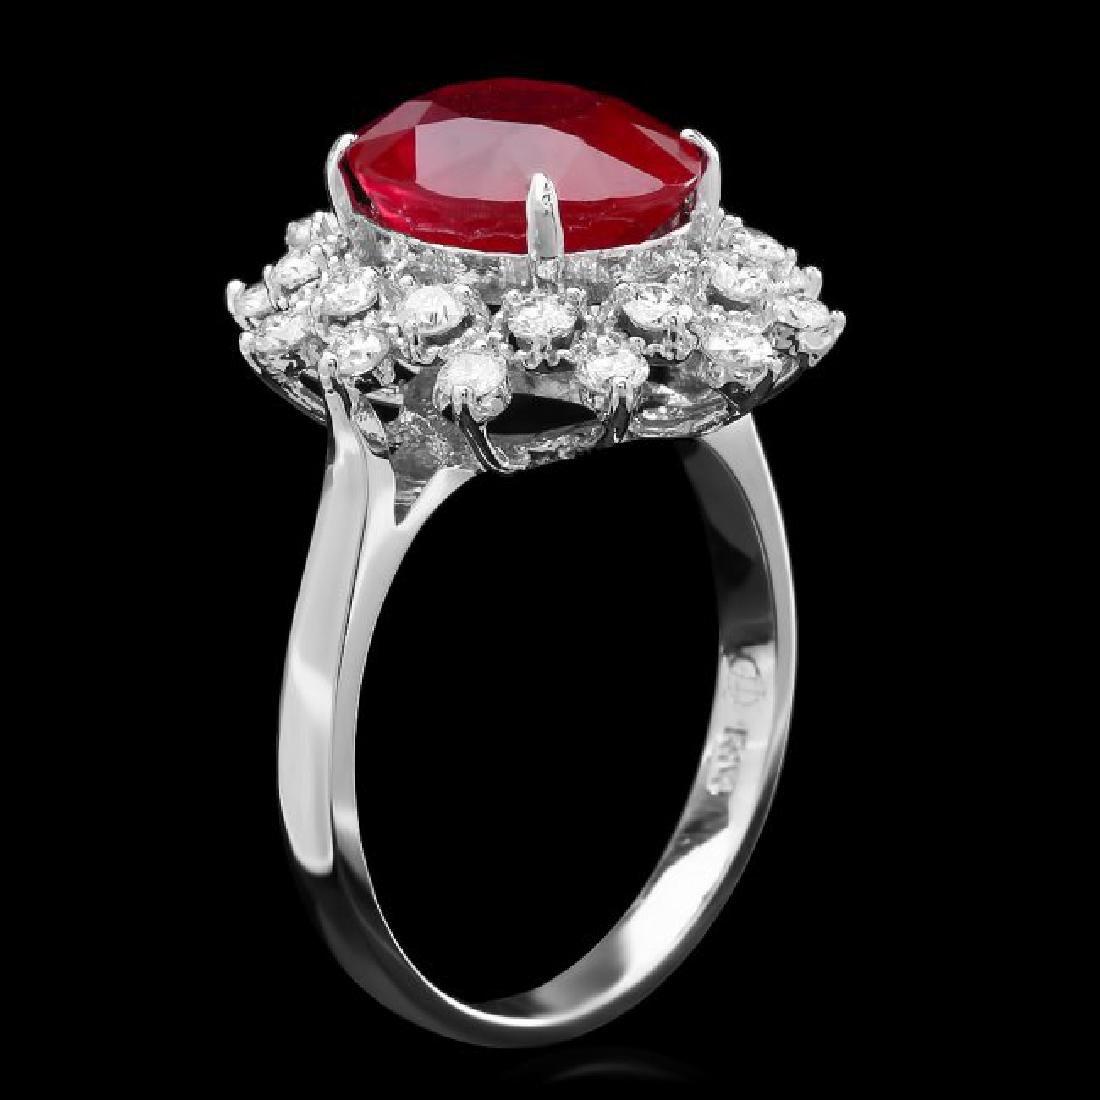 14k White Gold 5.00ct Ruby 0.80ct Diamond Ring - 2